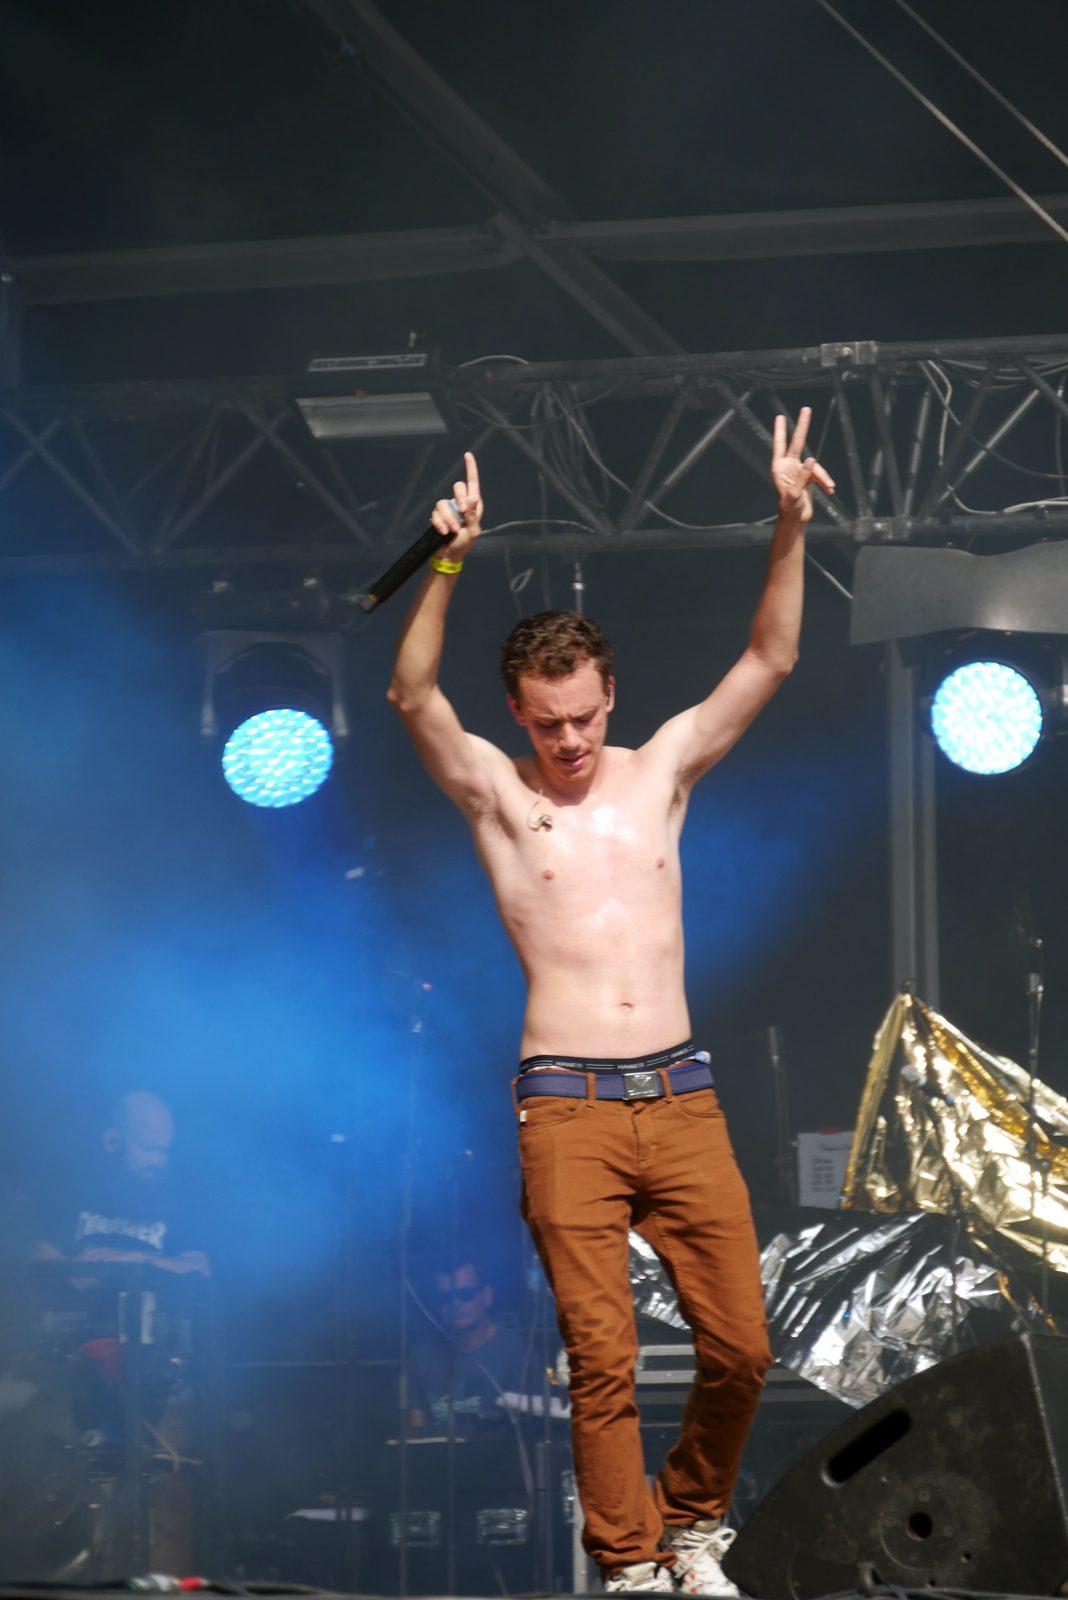 Logic shirtless live concert Rock en Seine 2016 festival logic301 Bobby Tarantino tour stage photo usofparis blog